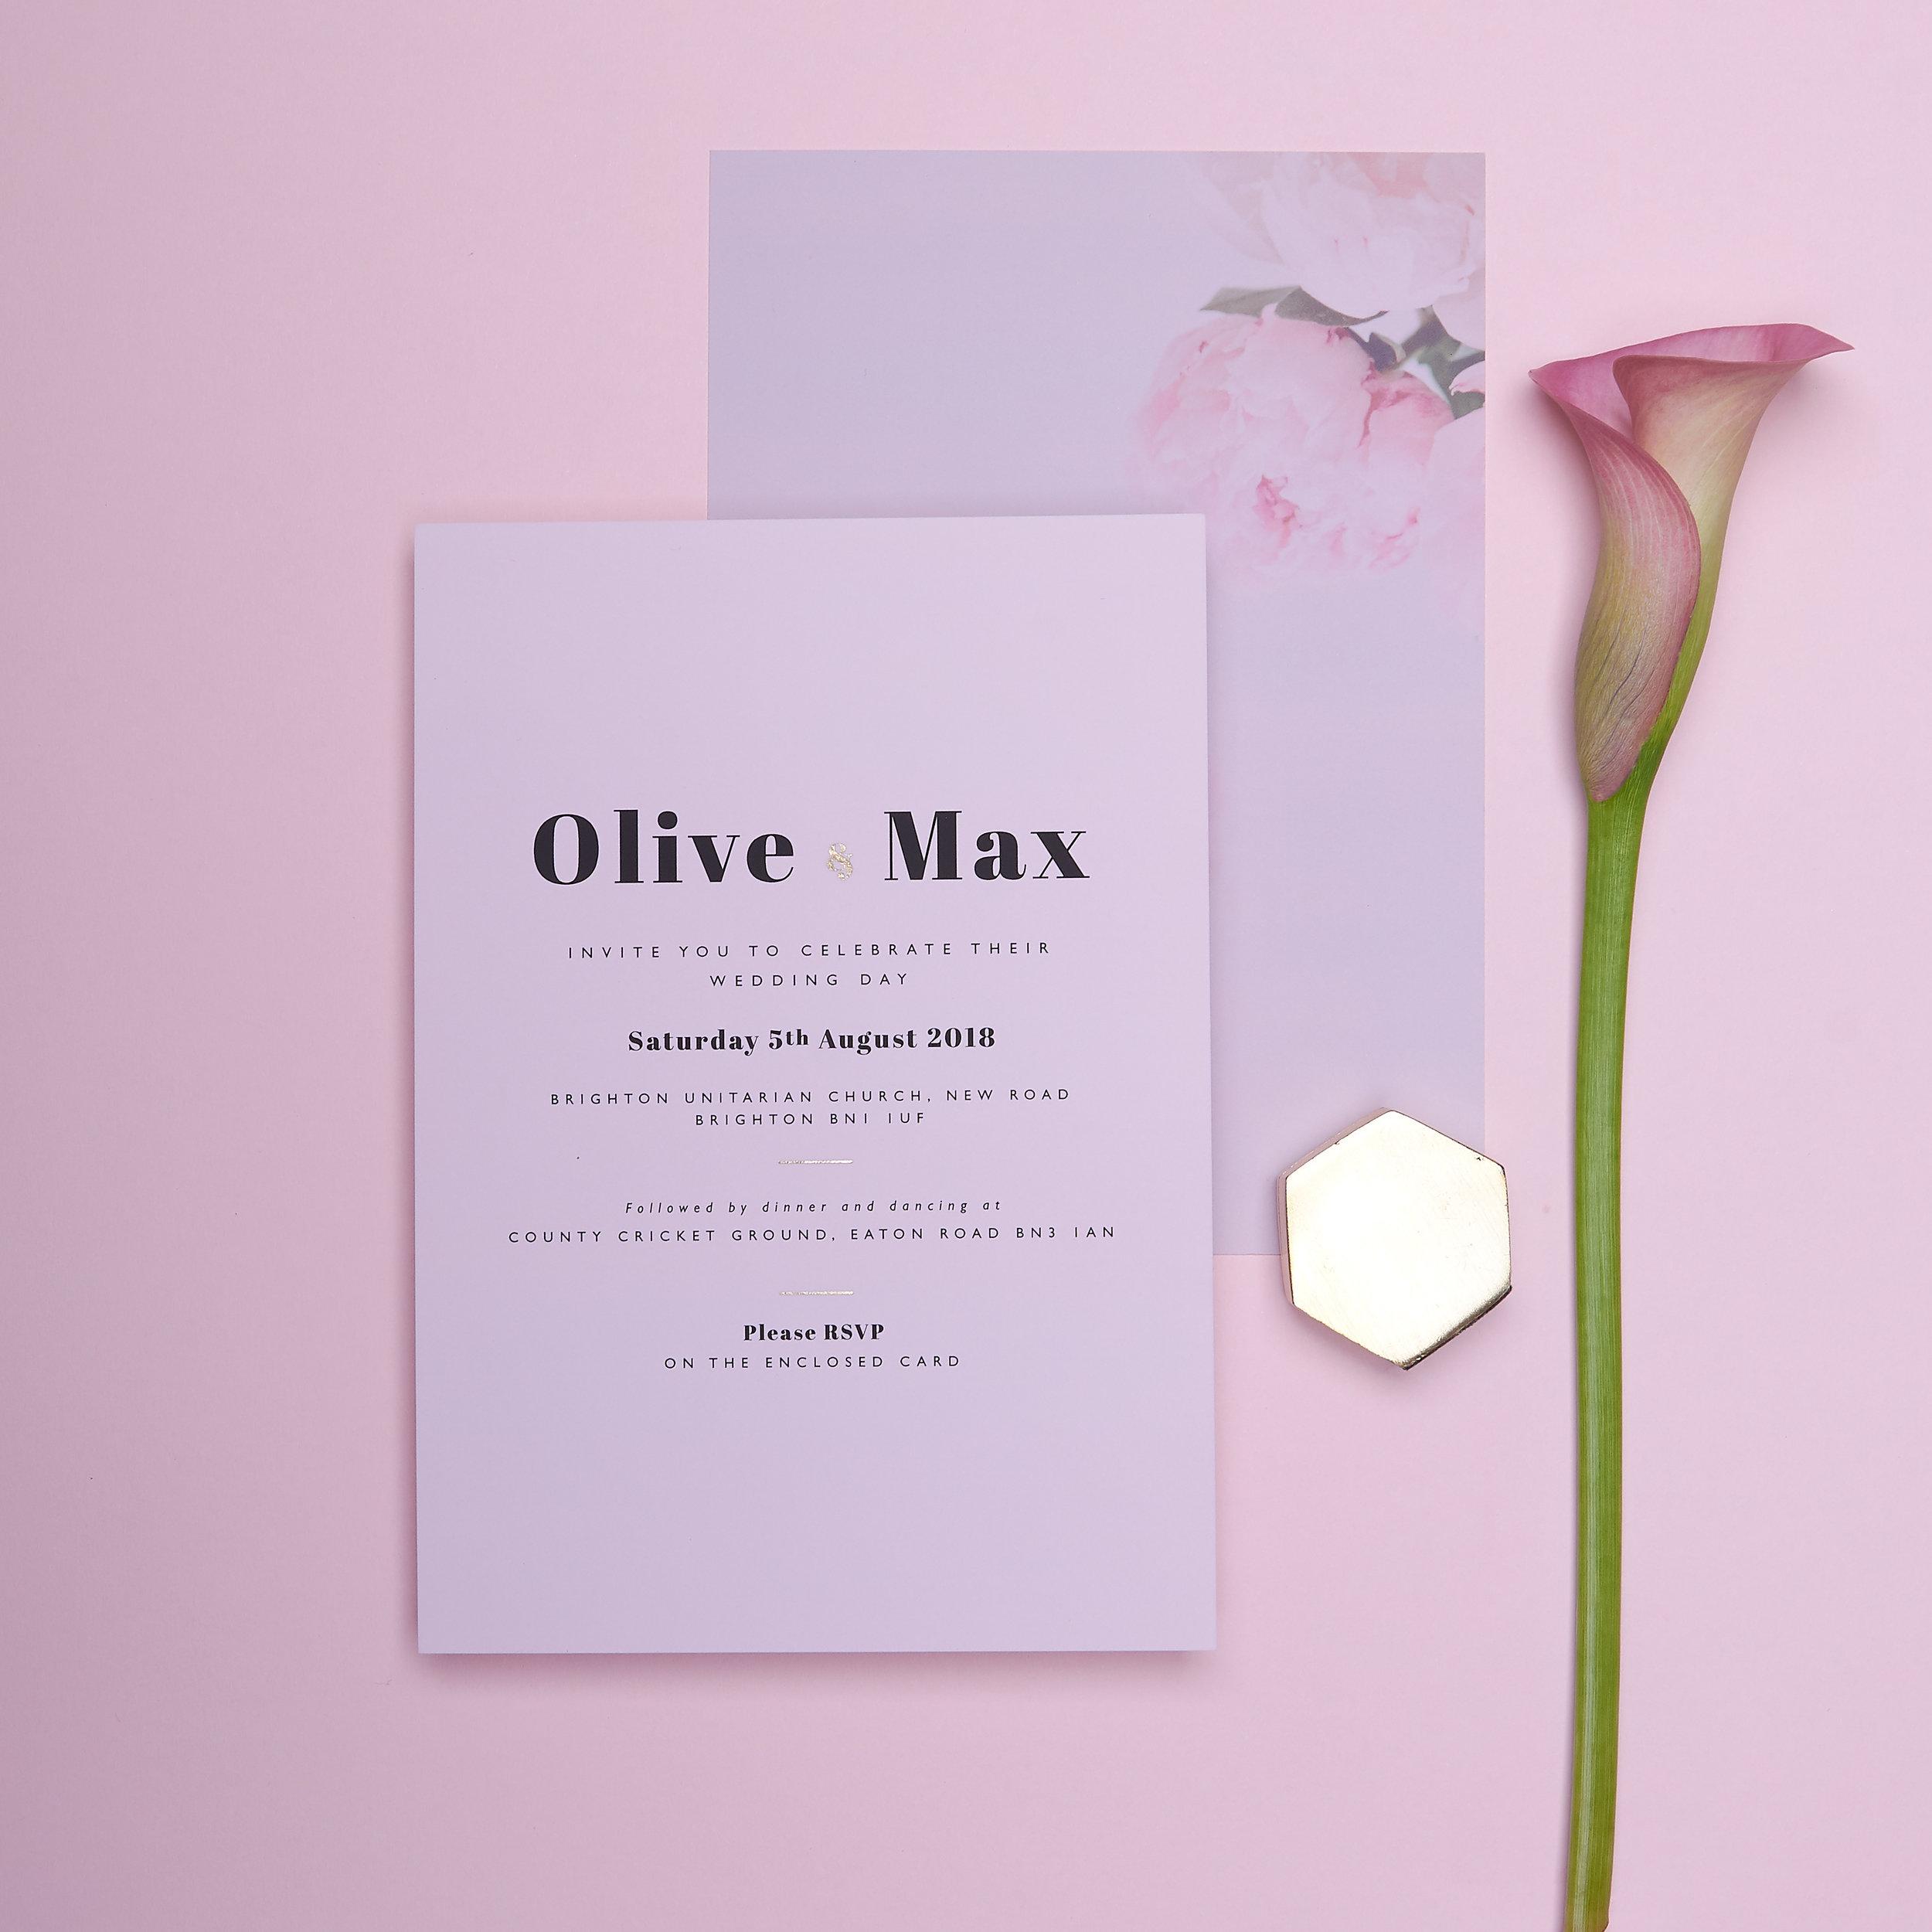 Olive_&_Max_1.jpg